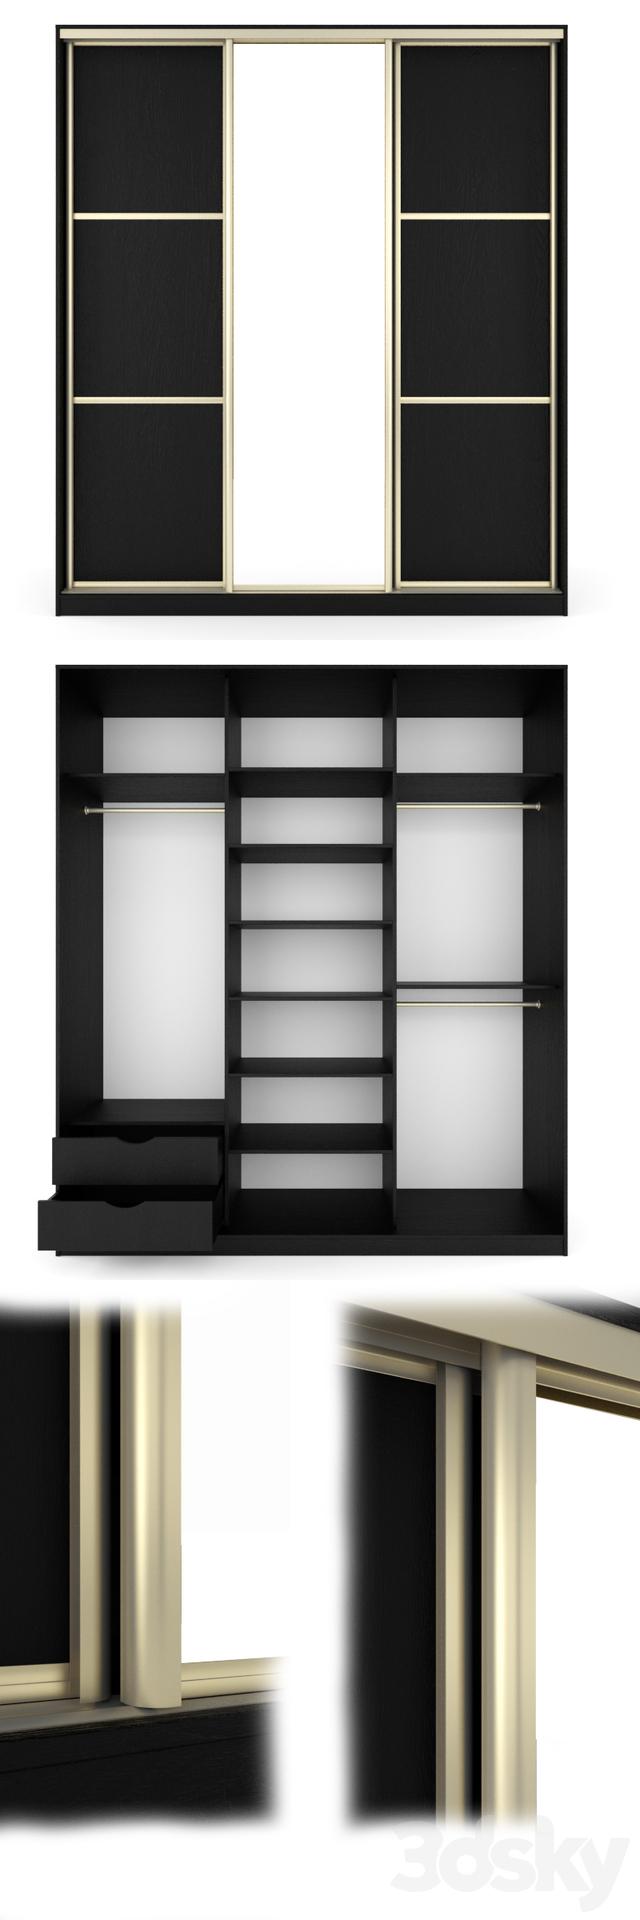 3d Models Wardrobe Display Cabinets Sliding Door Wardrobe With